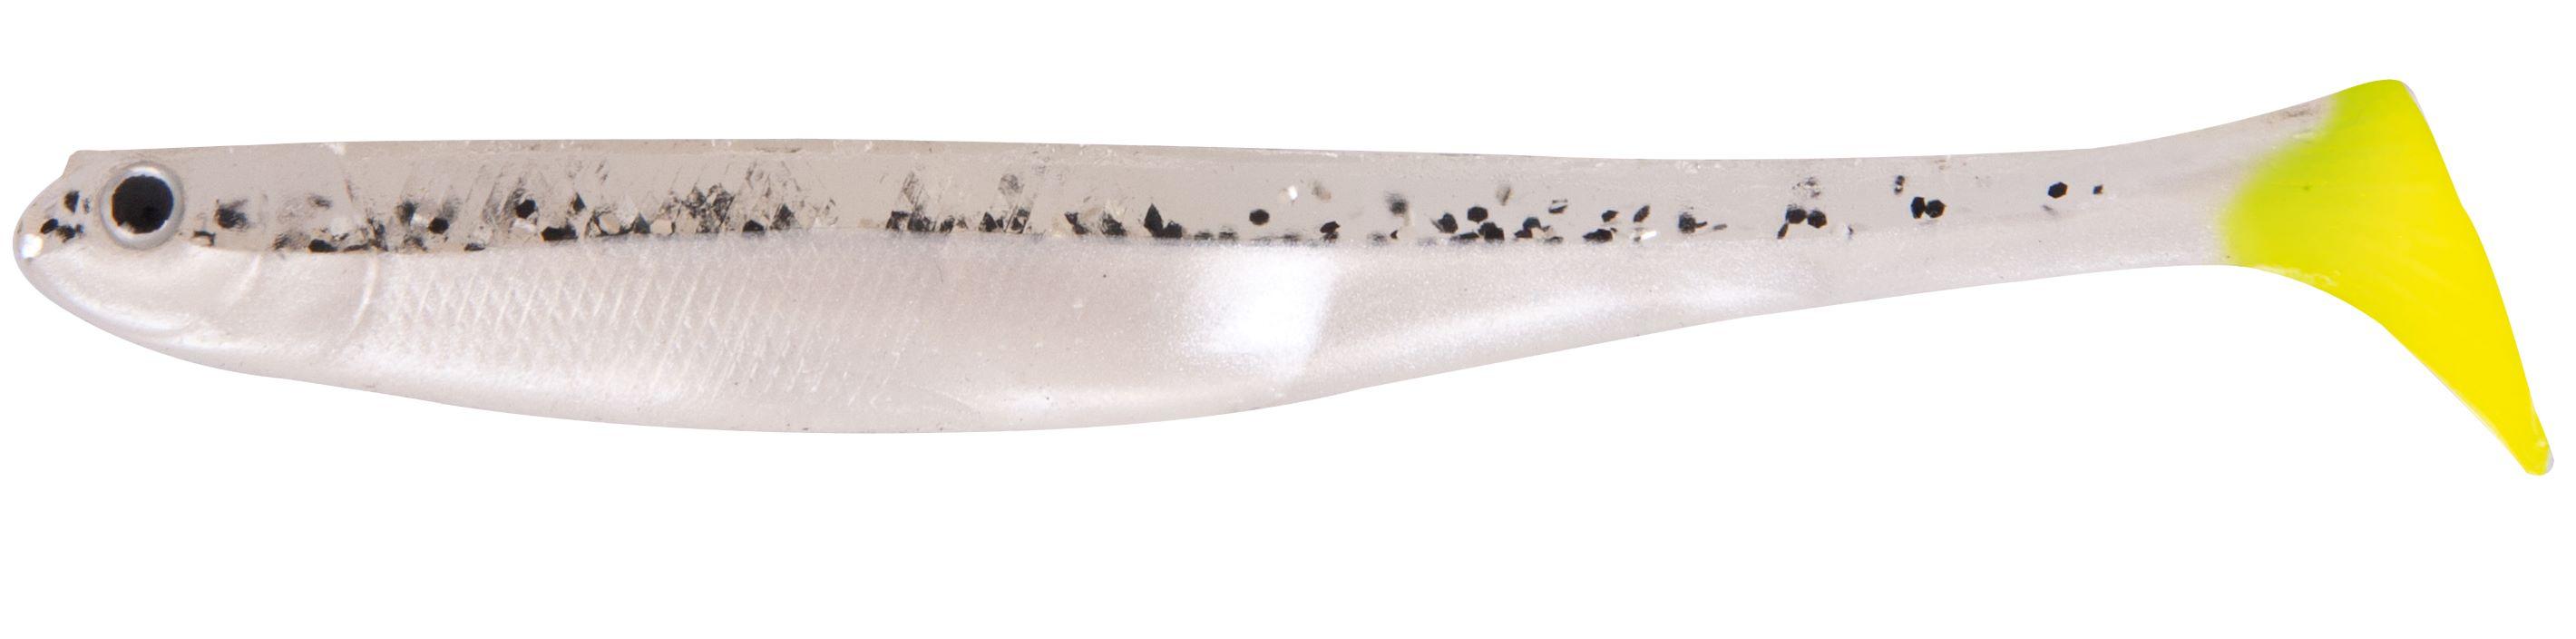 Iron Claw gumová nástraha Slim Jim 10 cm Vzor CT, 3ks